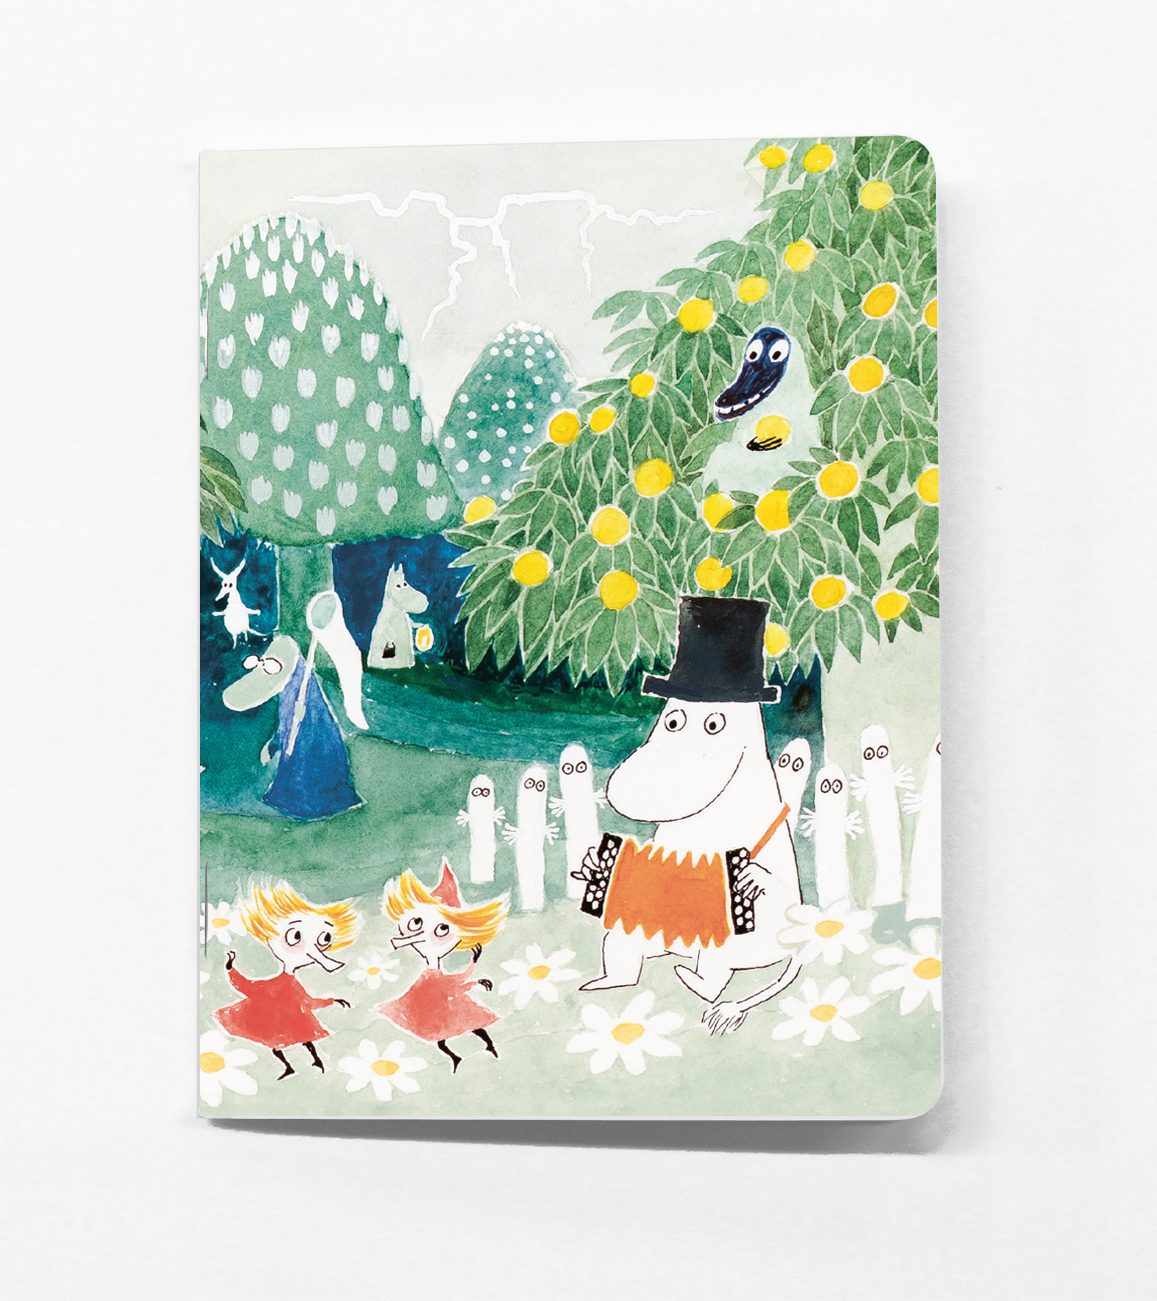 Putinki Mininote Finn Family Moomintroll 1